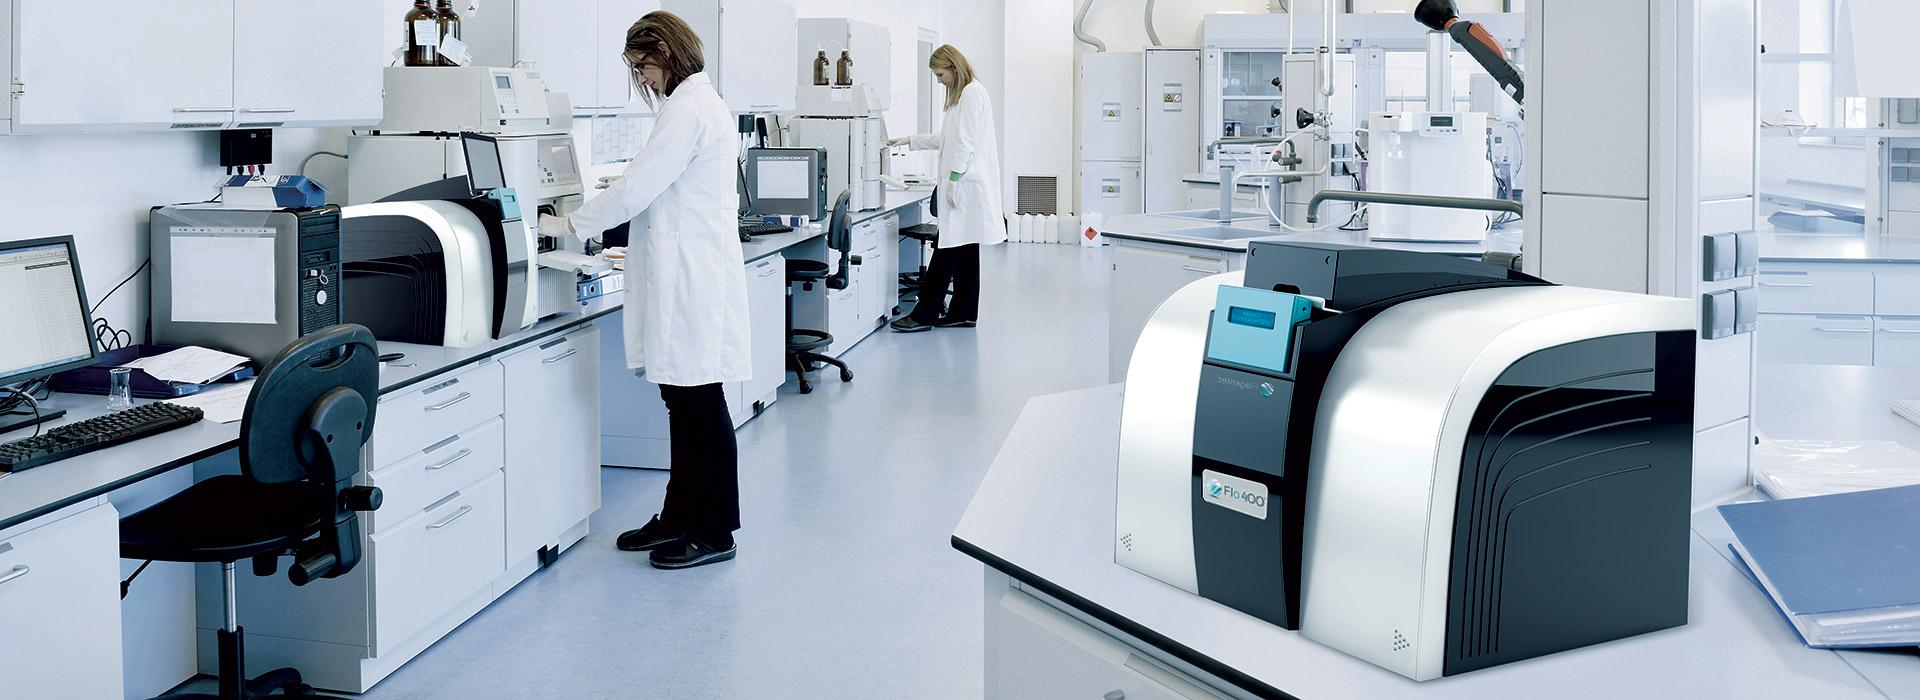 Flogentec - Flo400 - In Situ Detection